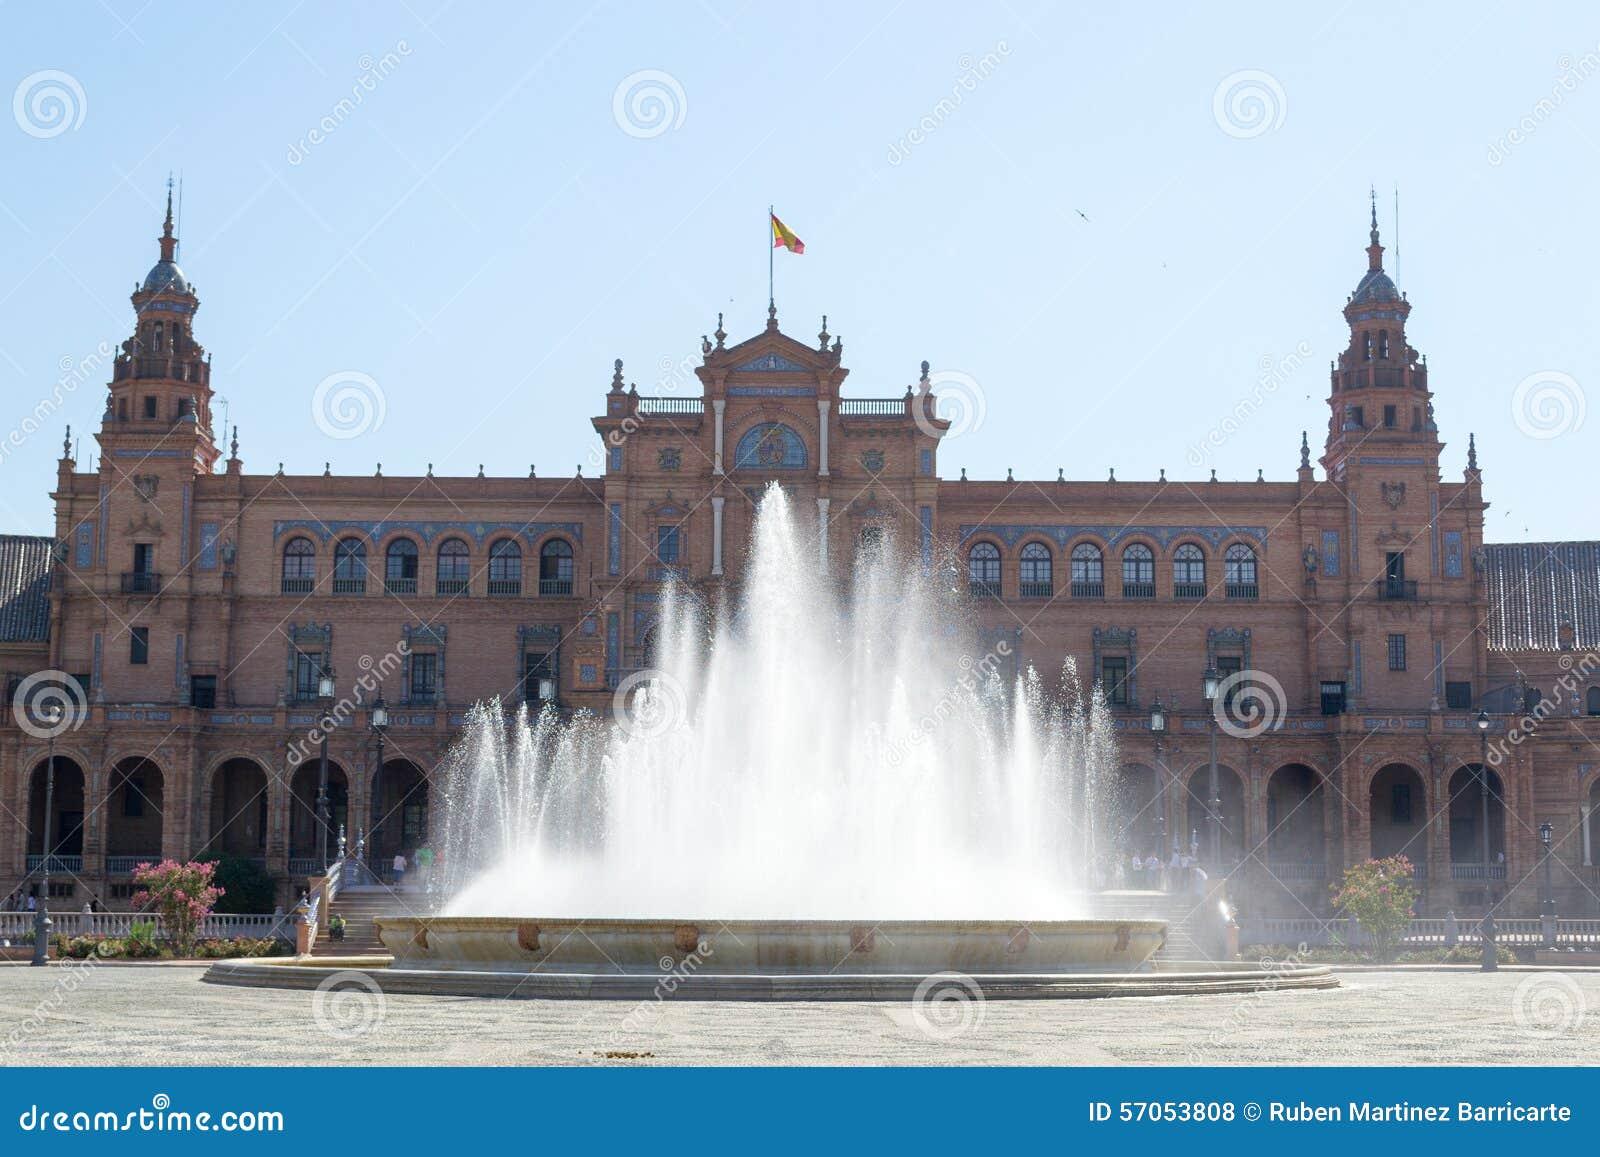 De vierkante fontein van Spanje